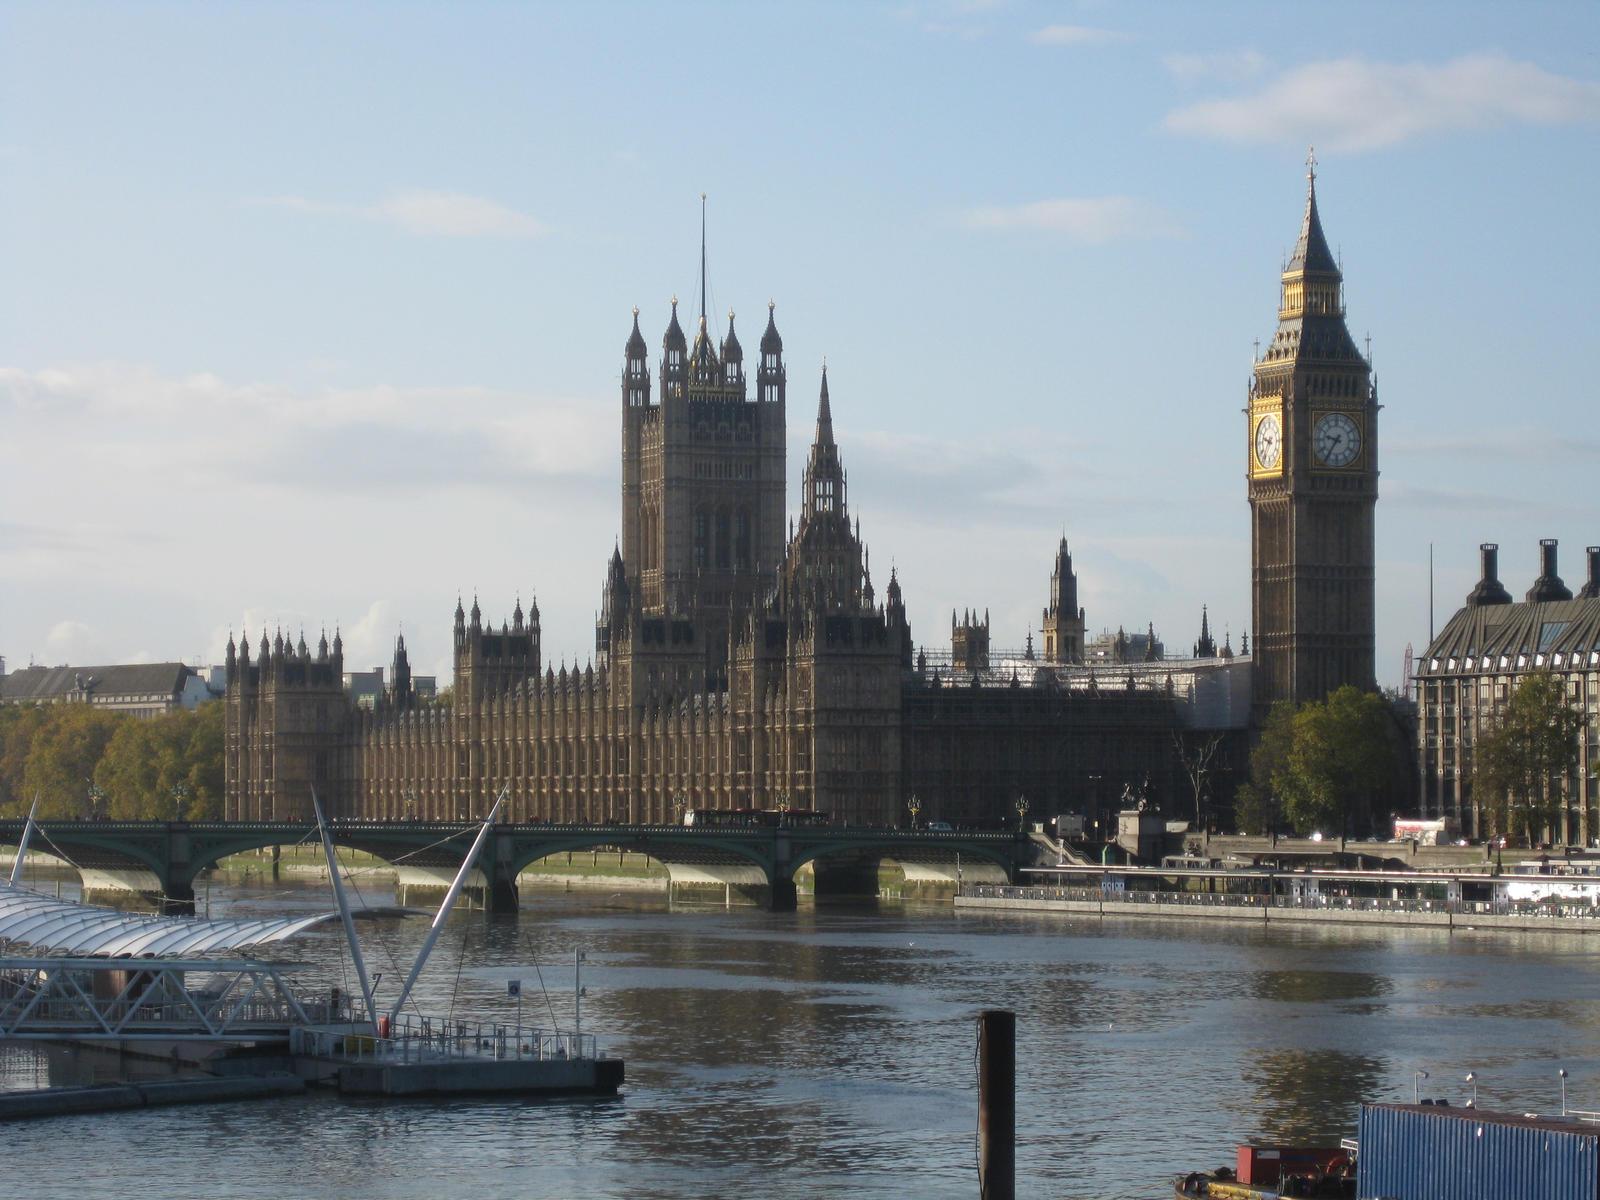 Westminster by TarJakArt